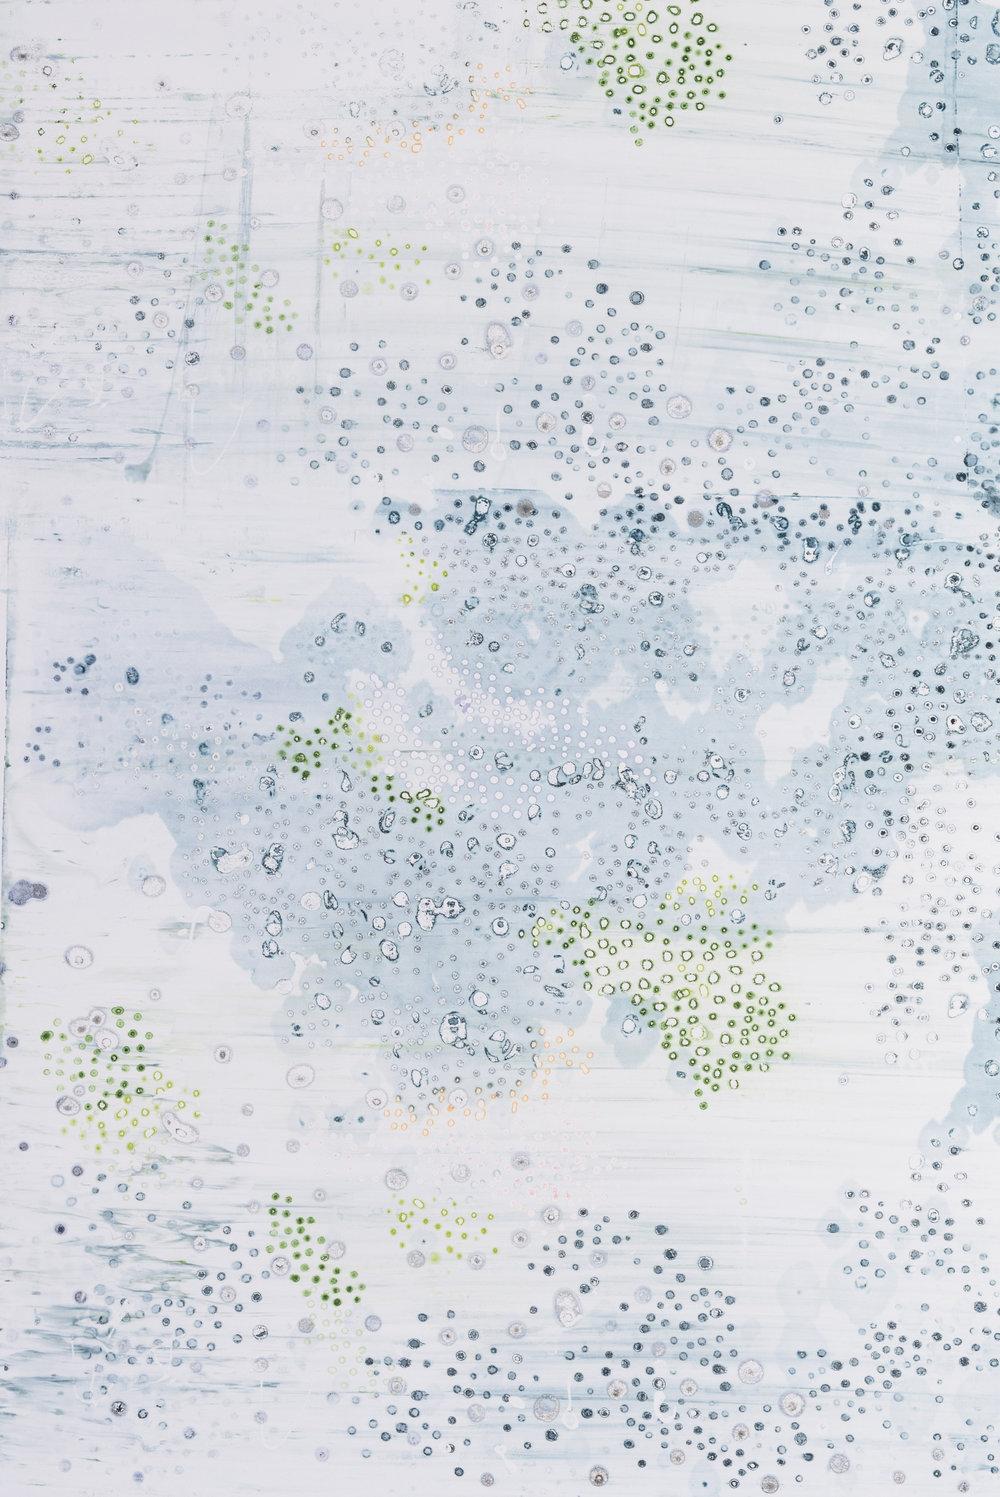 Pebble Beach V, 42X75. Silkscreen painting on paper, 2017.